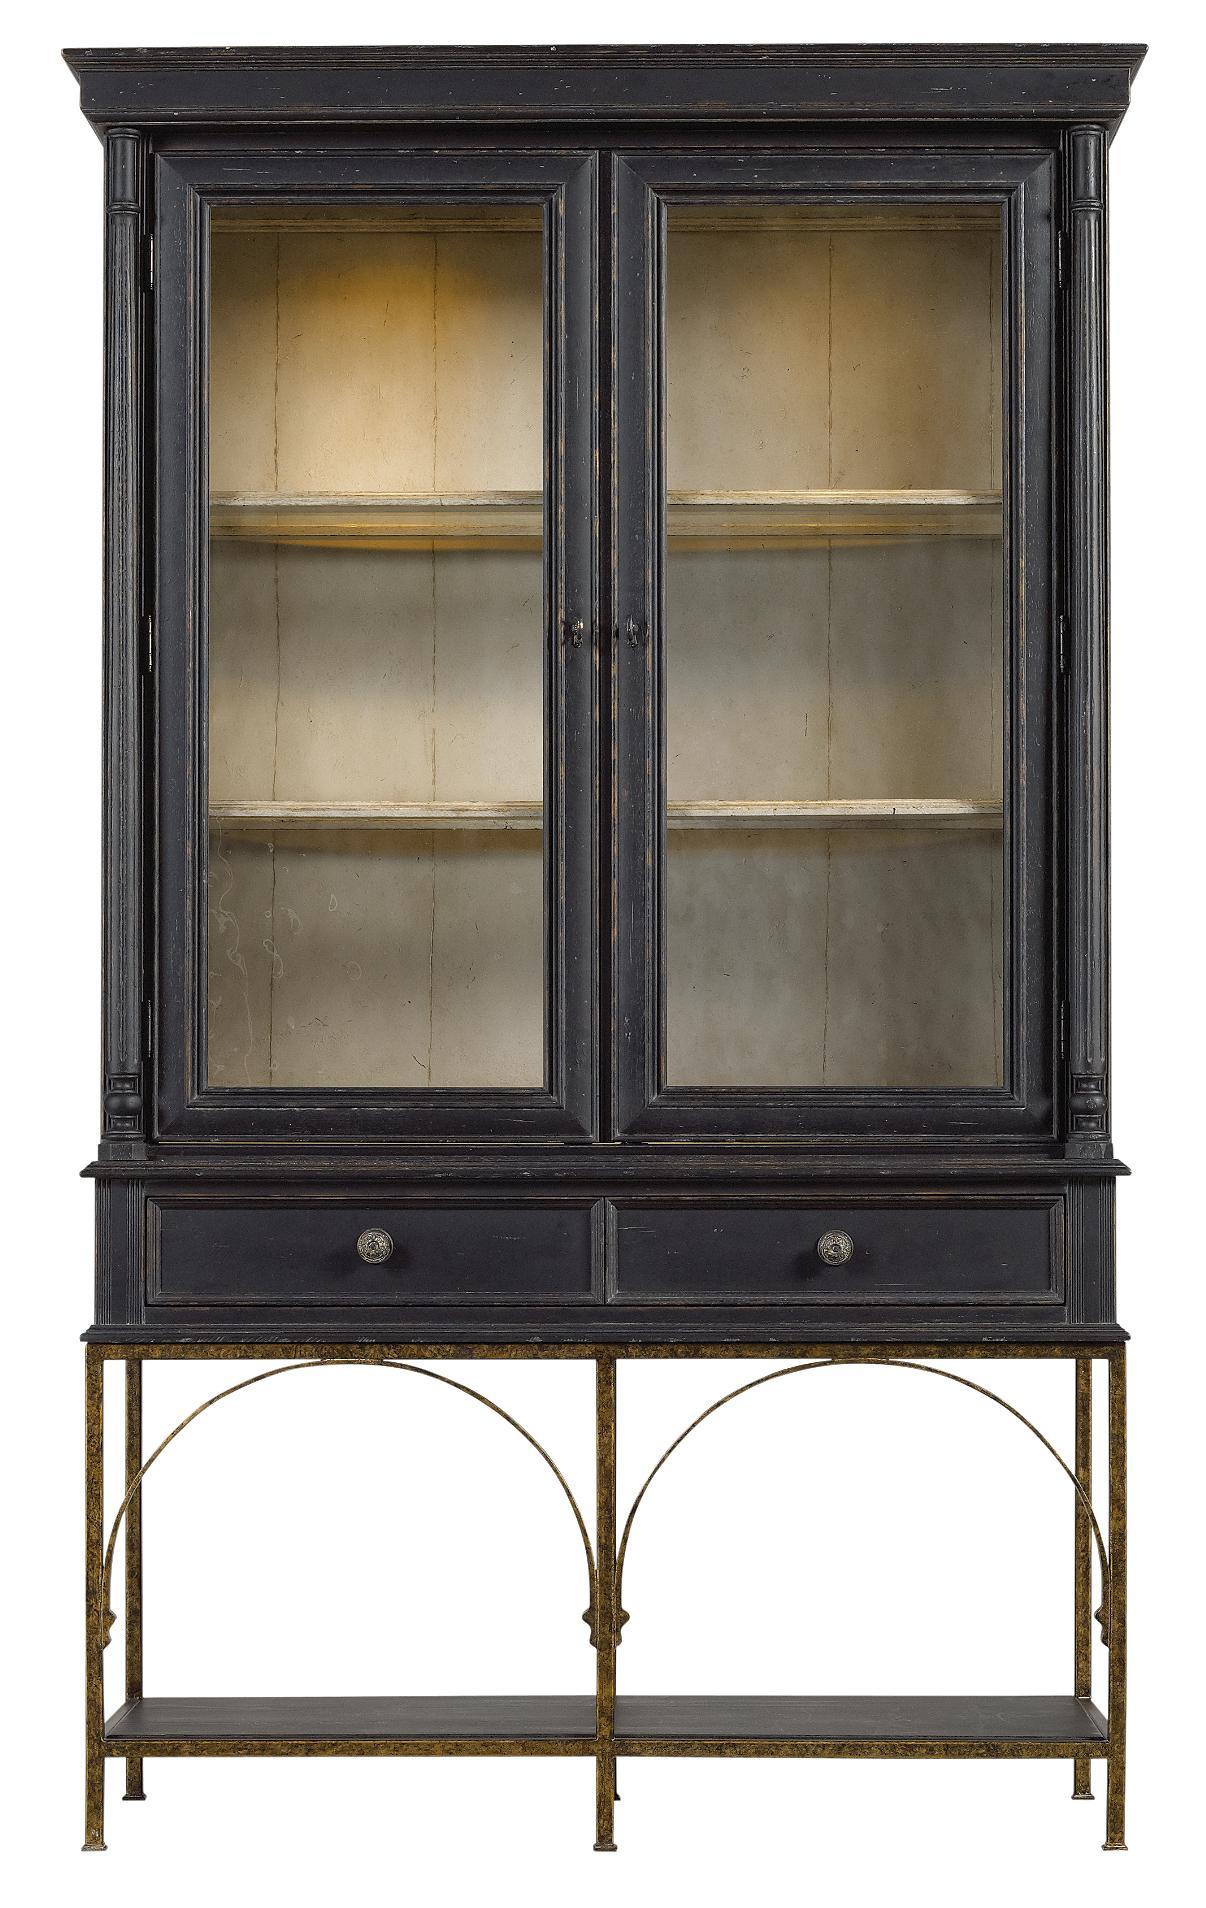 Stanley Furniture Arrondissement Salon Cercle Display Cabinet - Item Number: 222-85-10